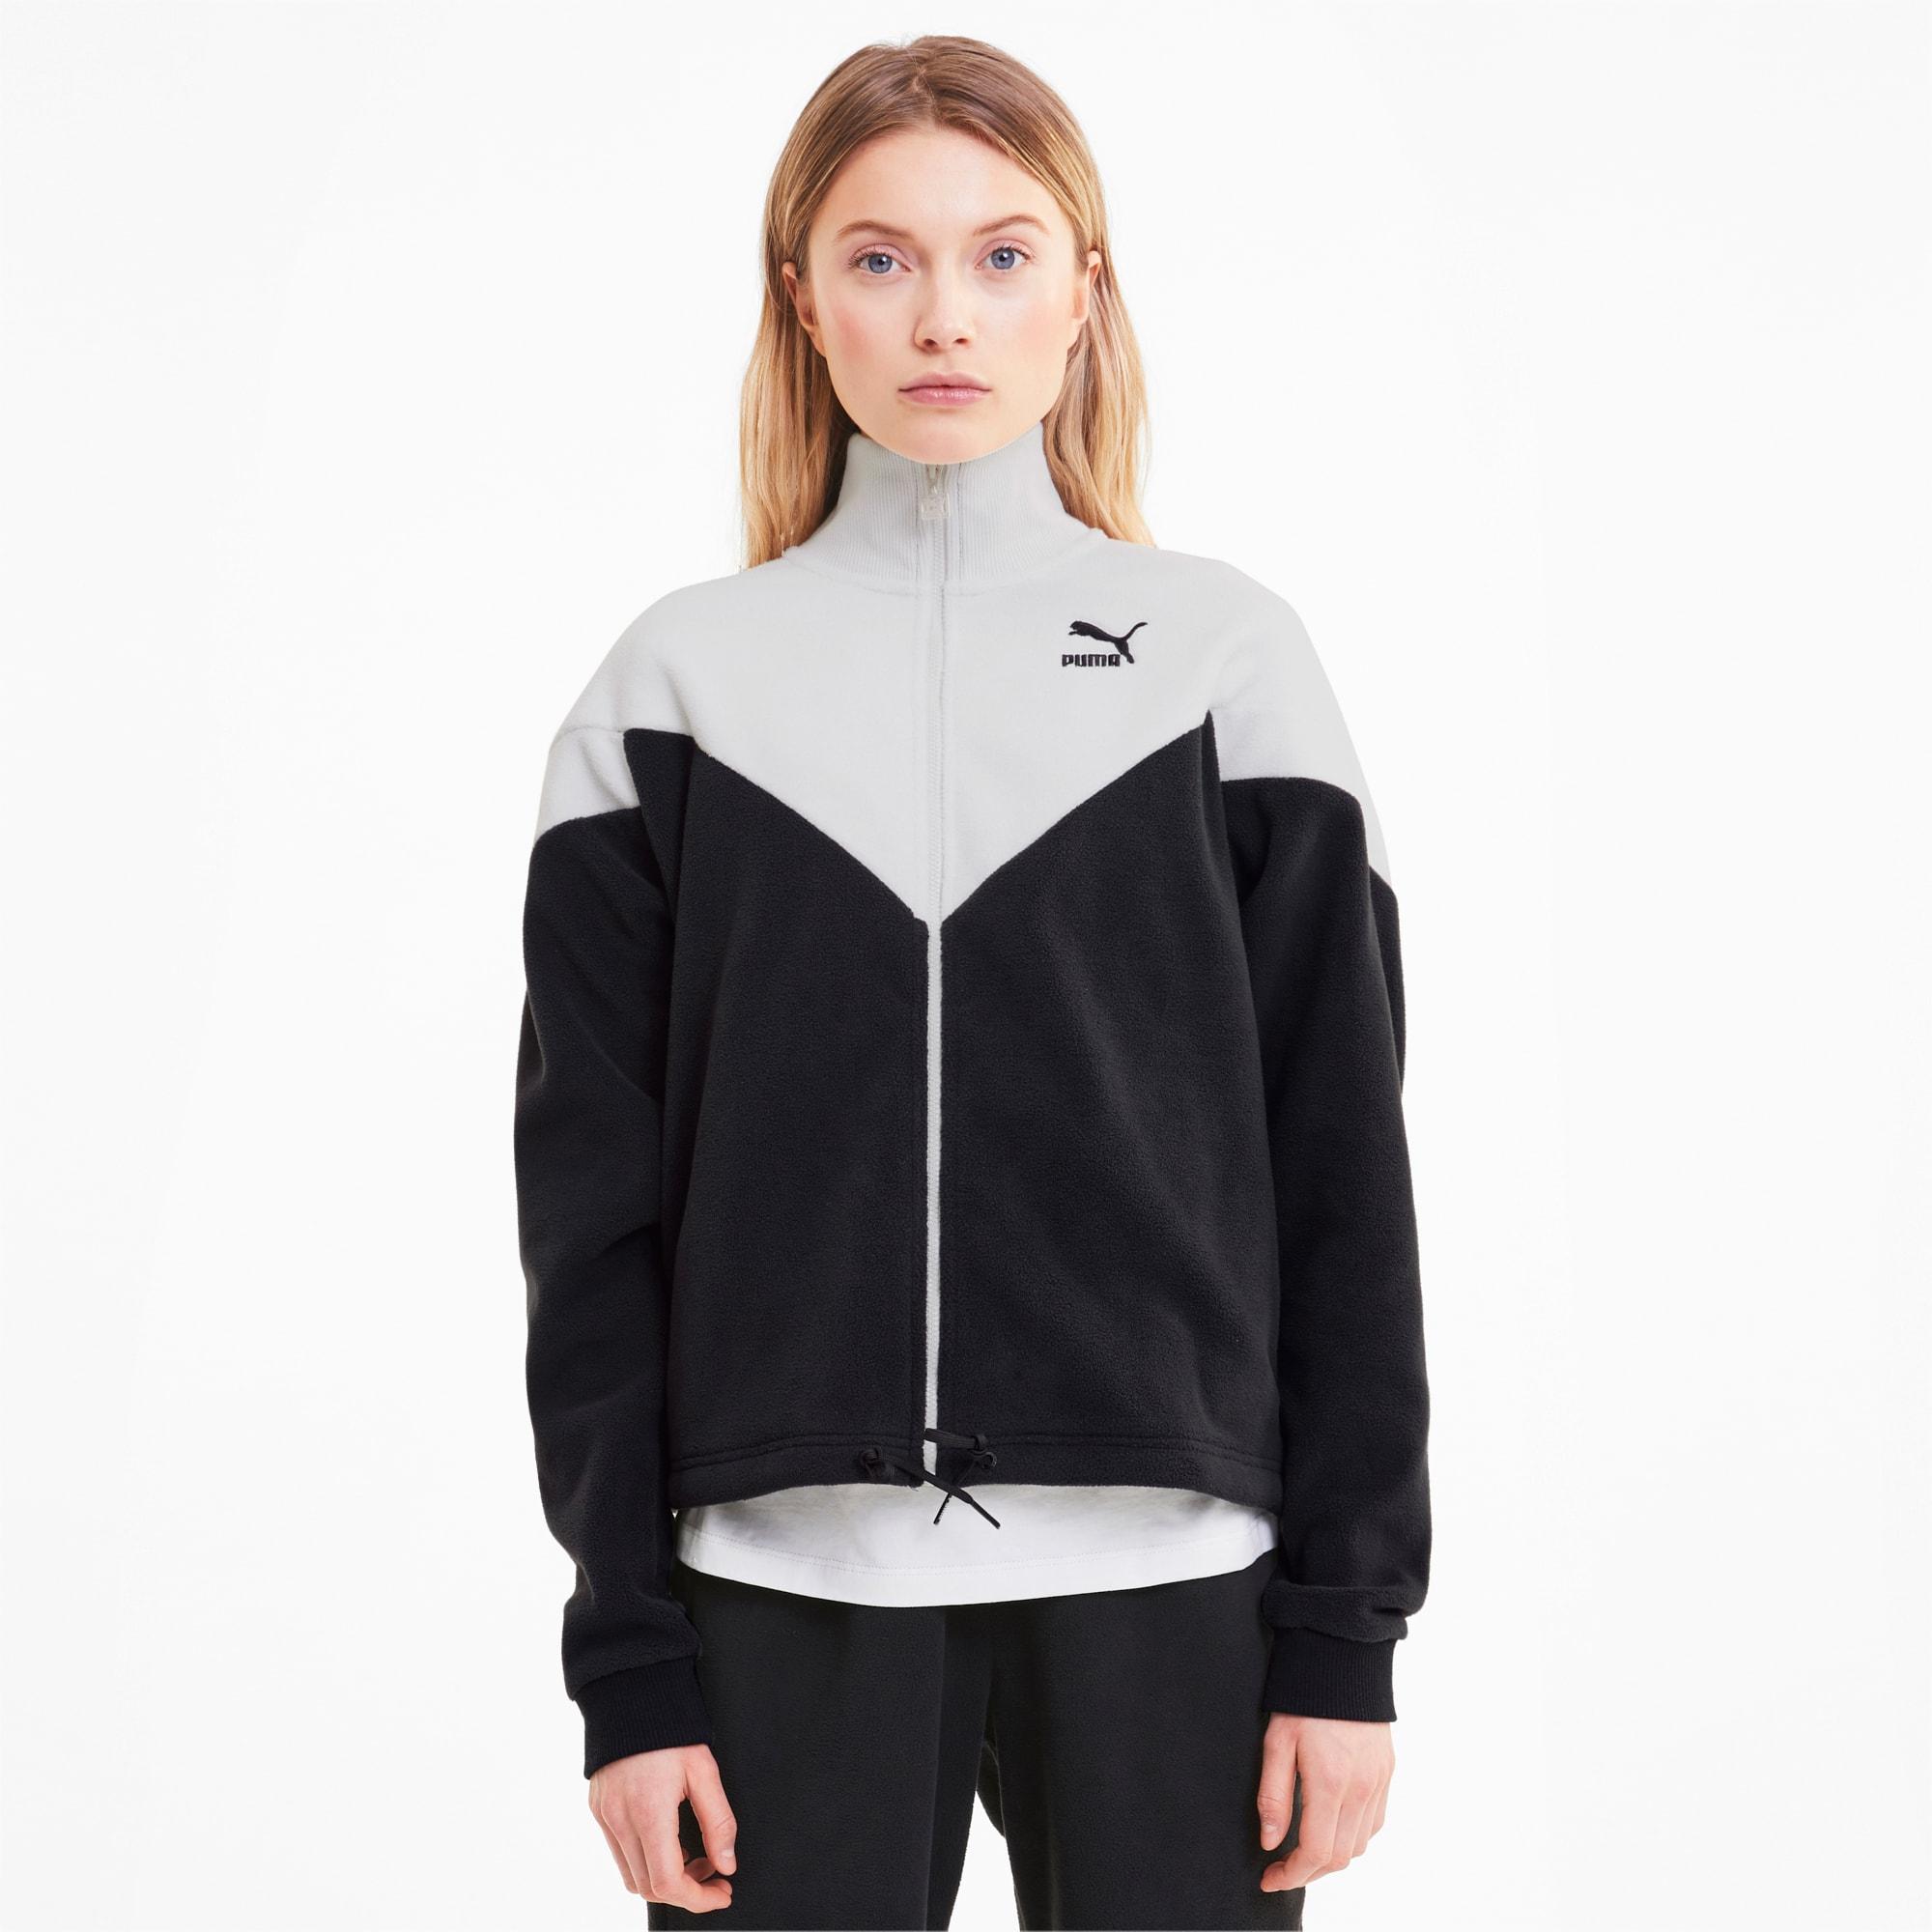 puma -  MCS Damen Trainingsjacke mit Polarfleece   Mit Aucun   Schwarz   Größe: L